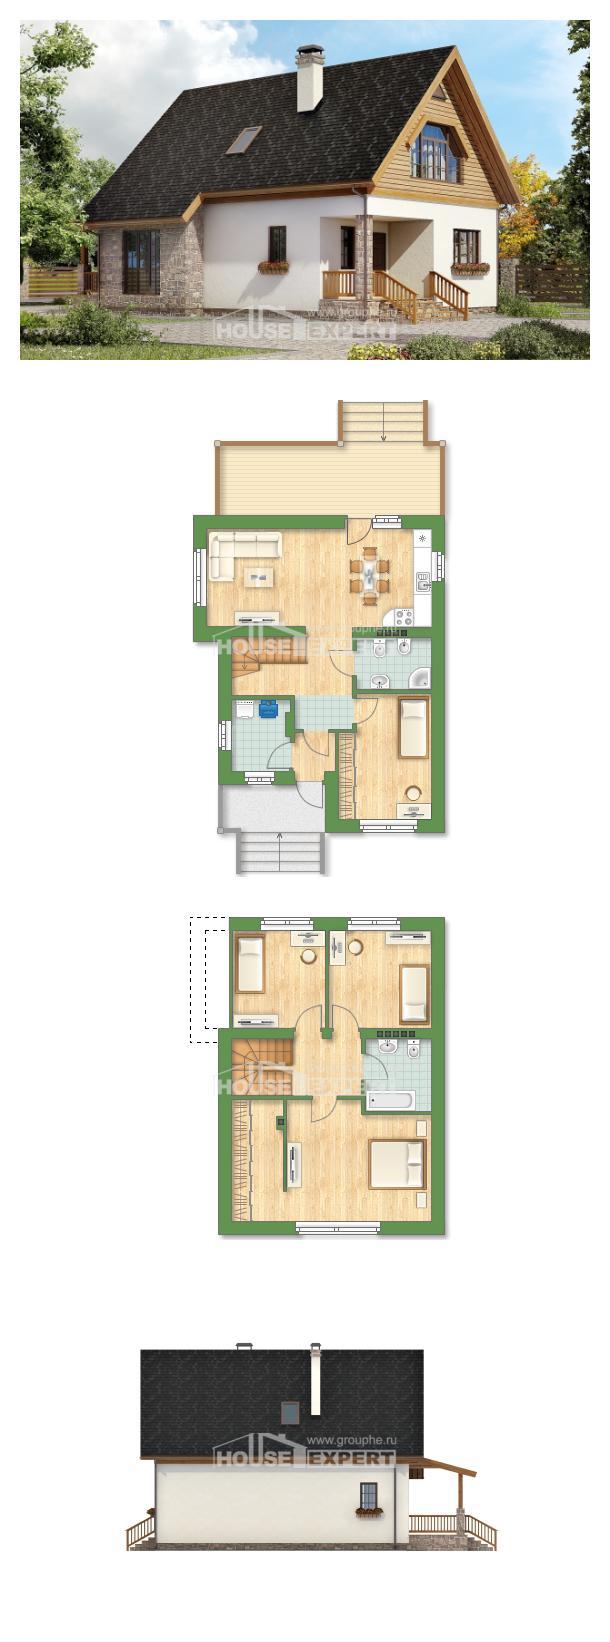 Проект дома 140-001-Л   House Expert